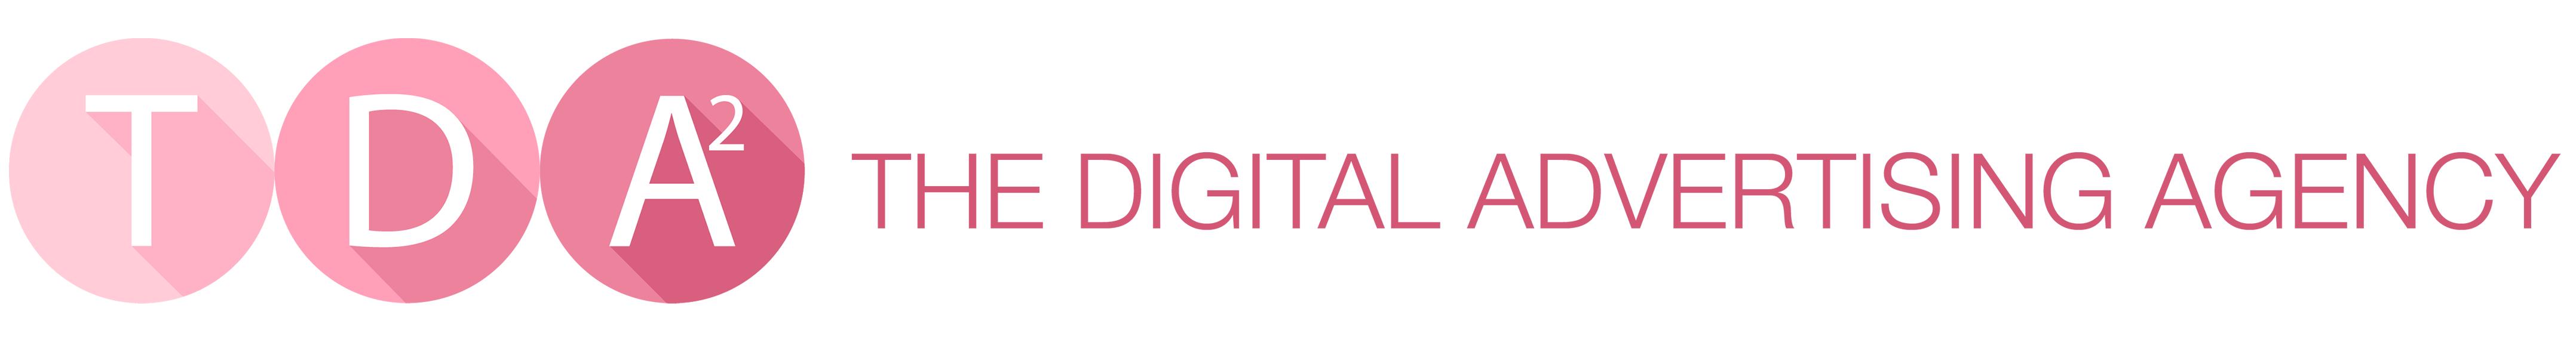 The Digital Advertising Agency